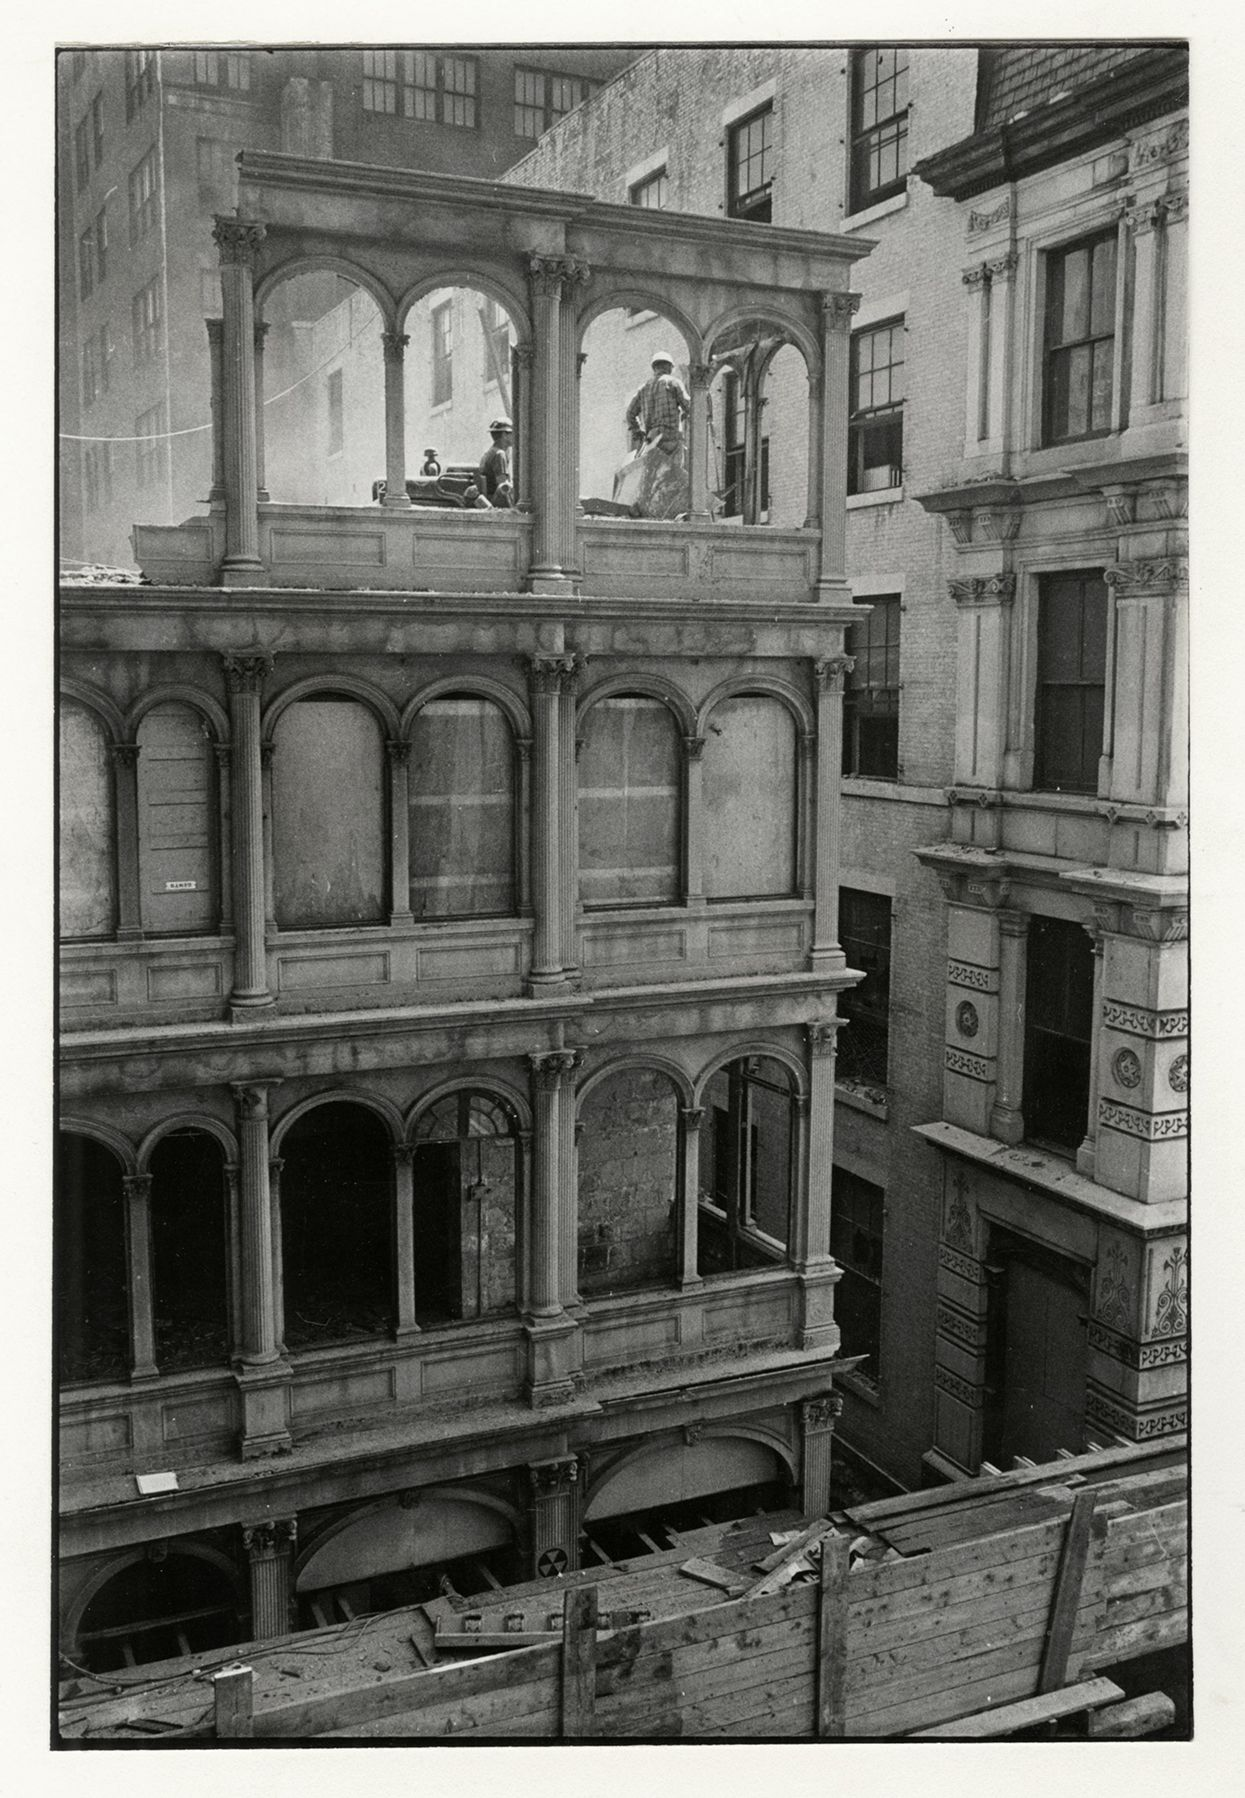 Copyright Danny Lyon / Magnum Photos, Beekman Place, New York, from The Destruction of Lower Manhattan, 1967